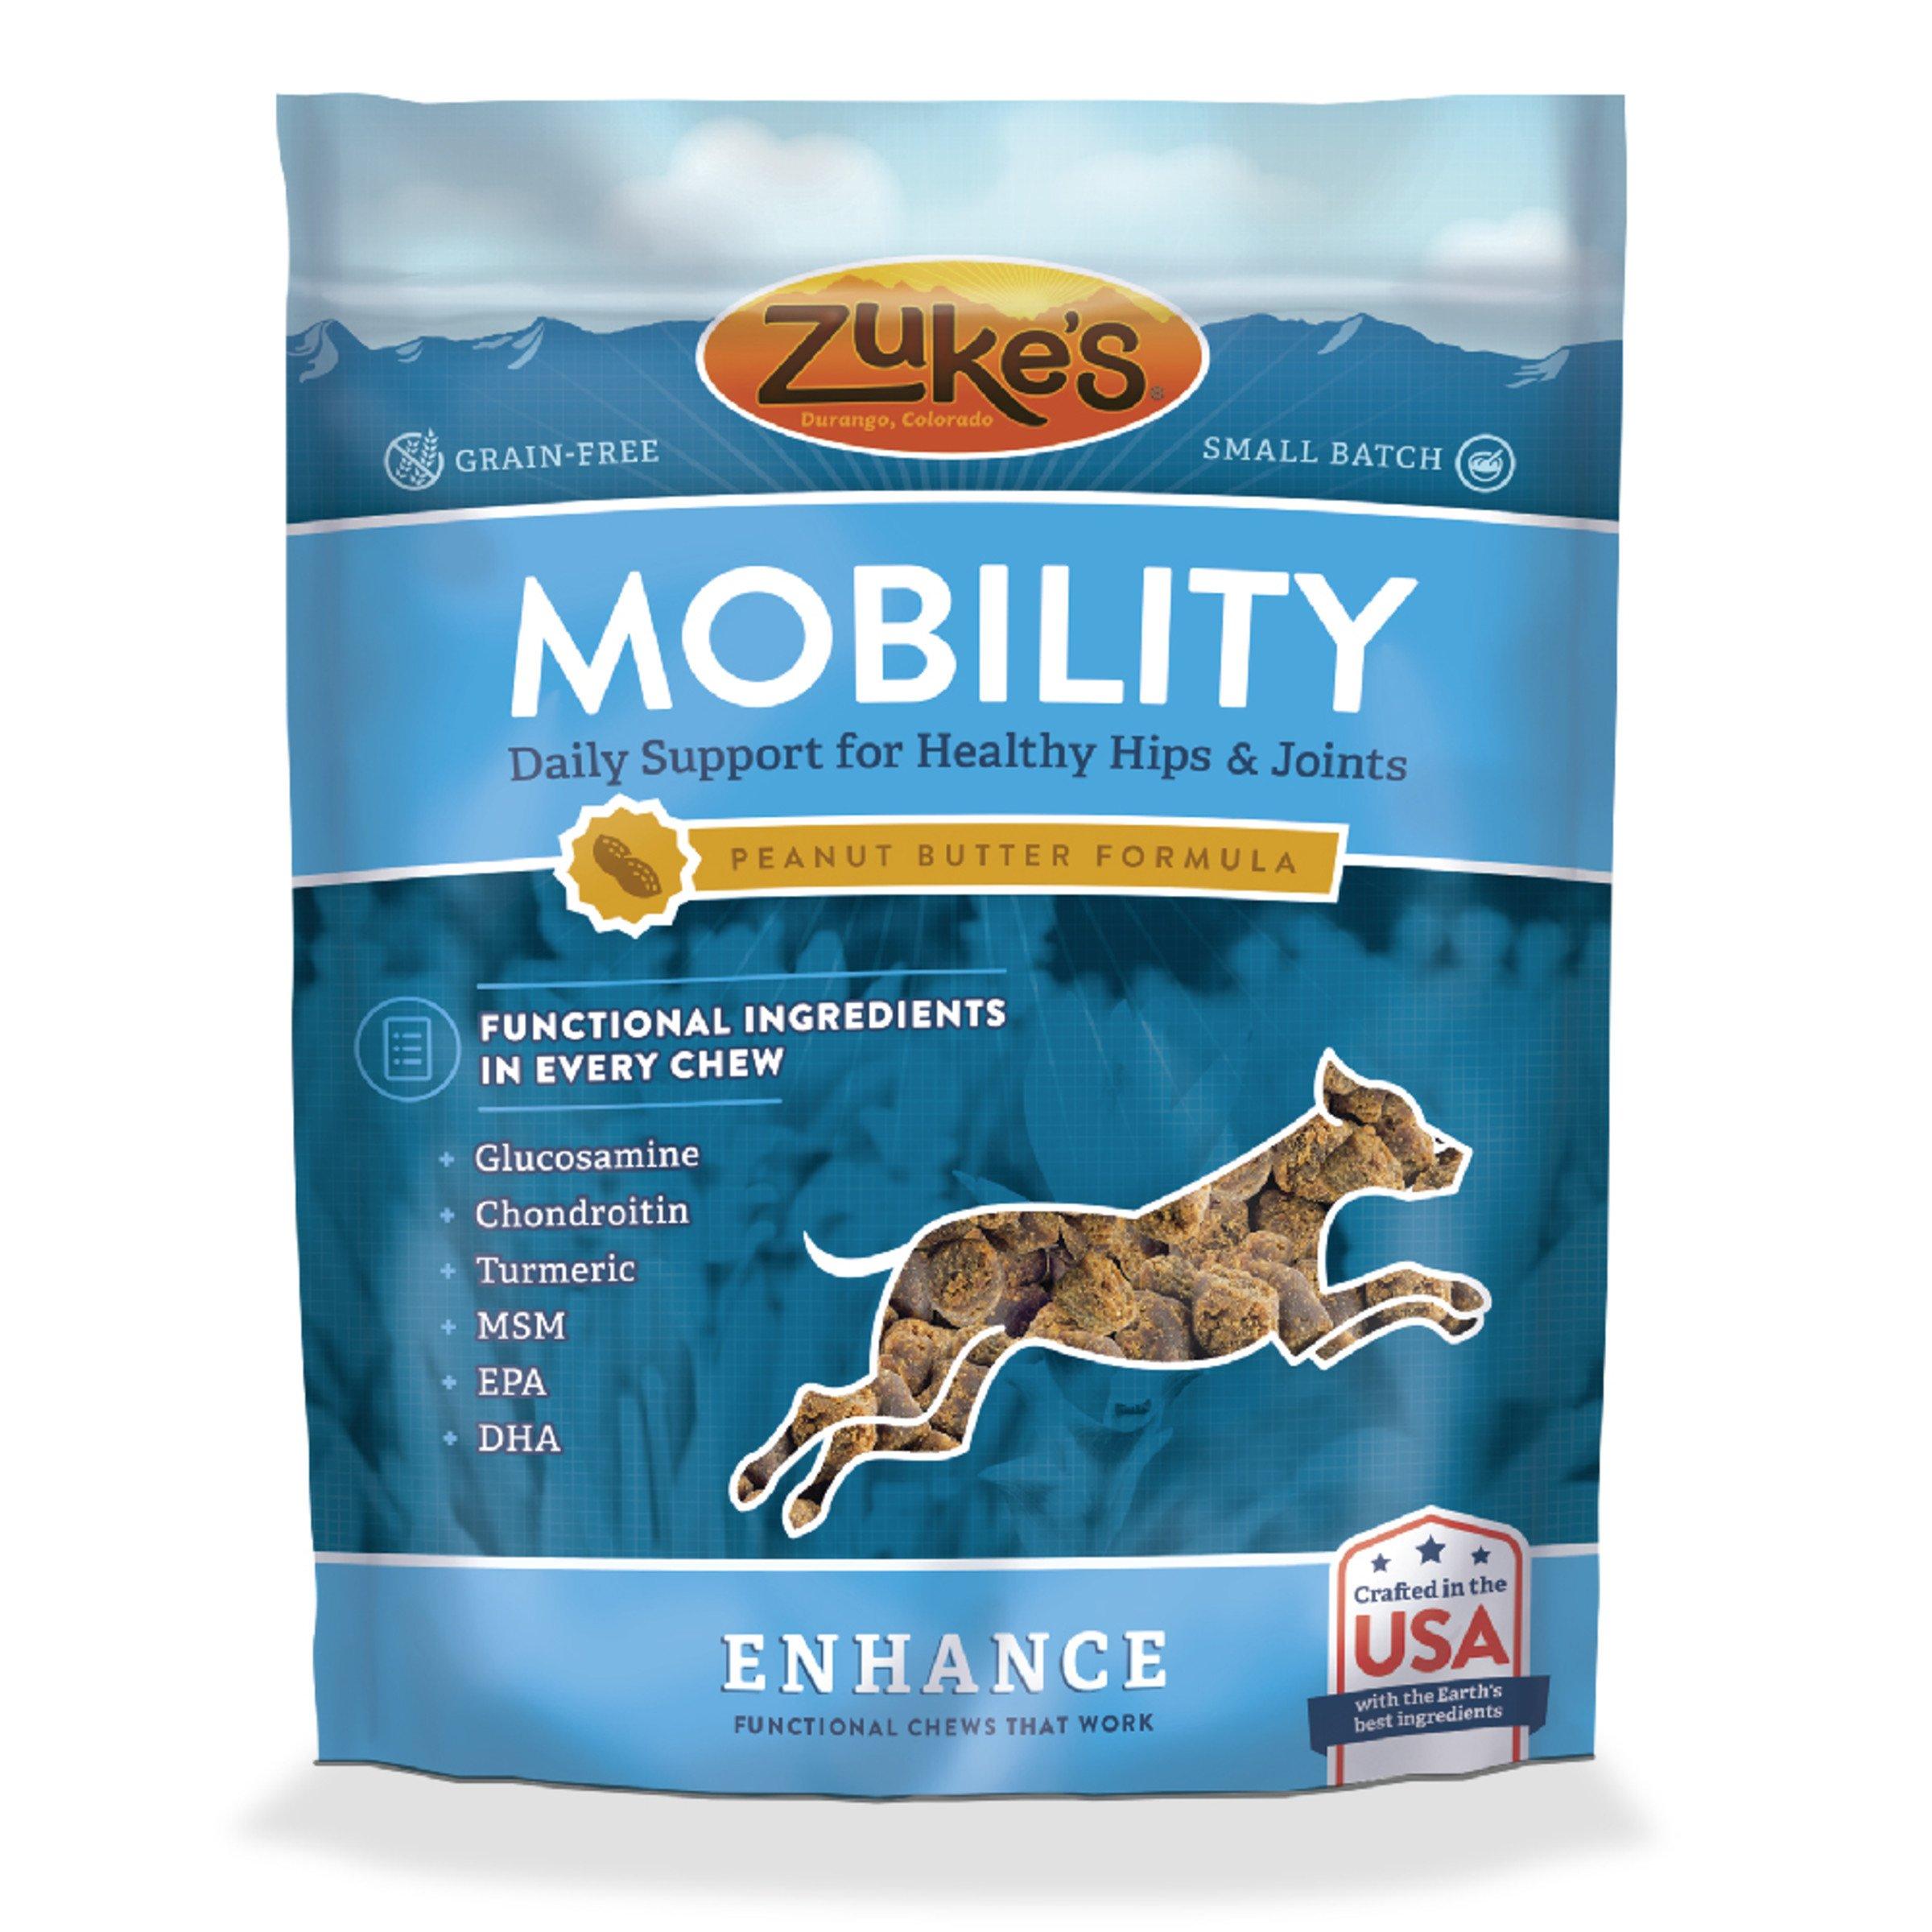 Zuke's Enhance Mobility Peanut Butter Formula Functional Dog Chews - 5 oz. Pouch